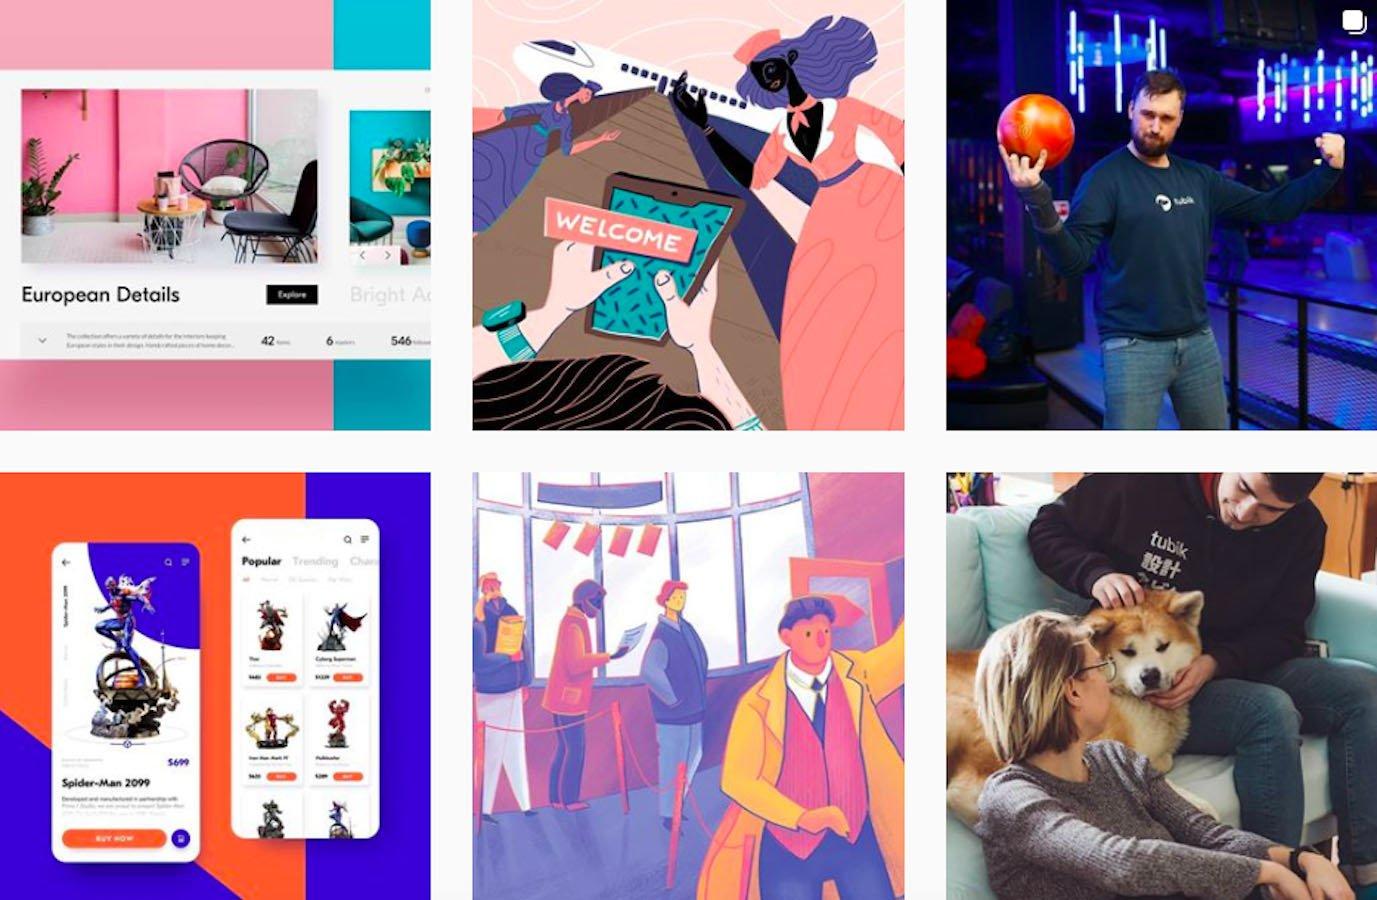 Web Design Inspiration: 110+ Accounts On Instagram and 10+ Best UX & Web Design Books in 2020 - tubikstudio